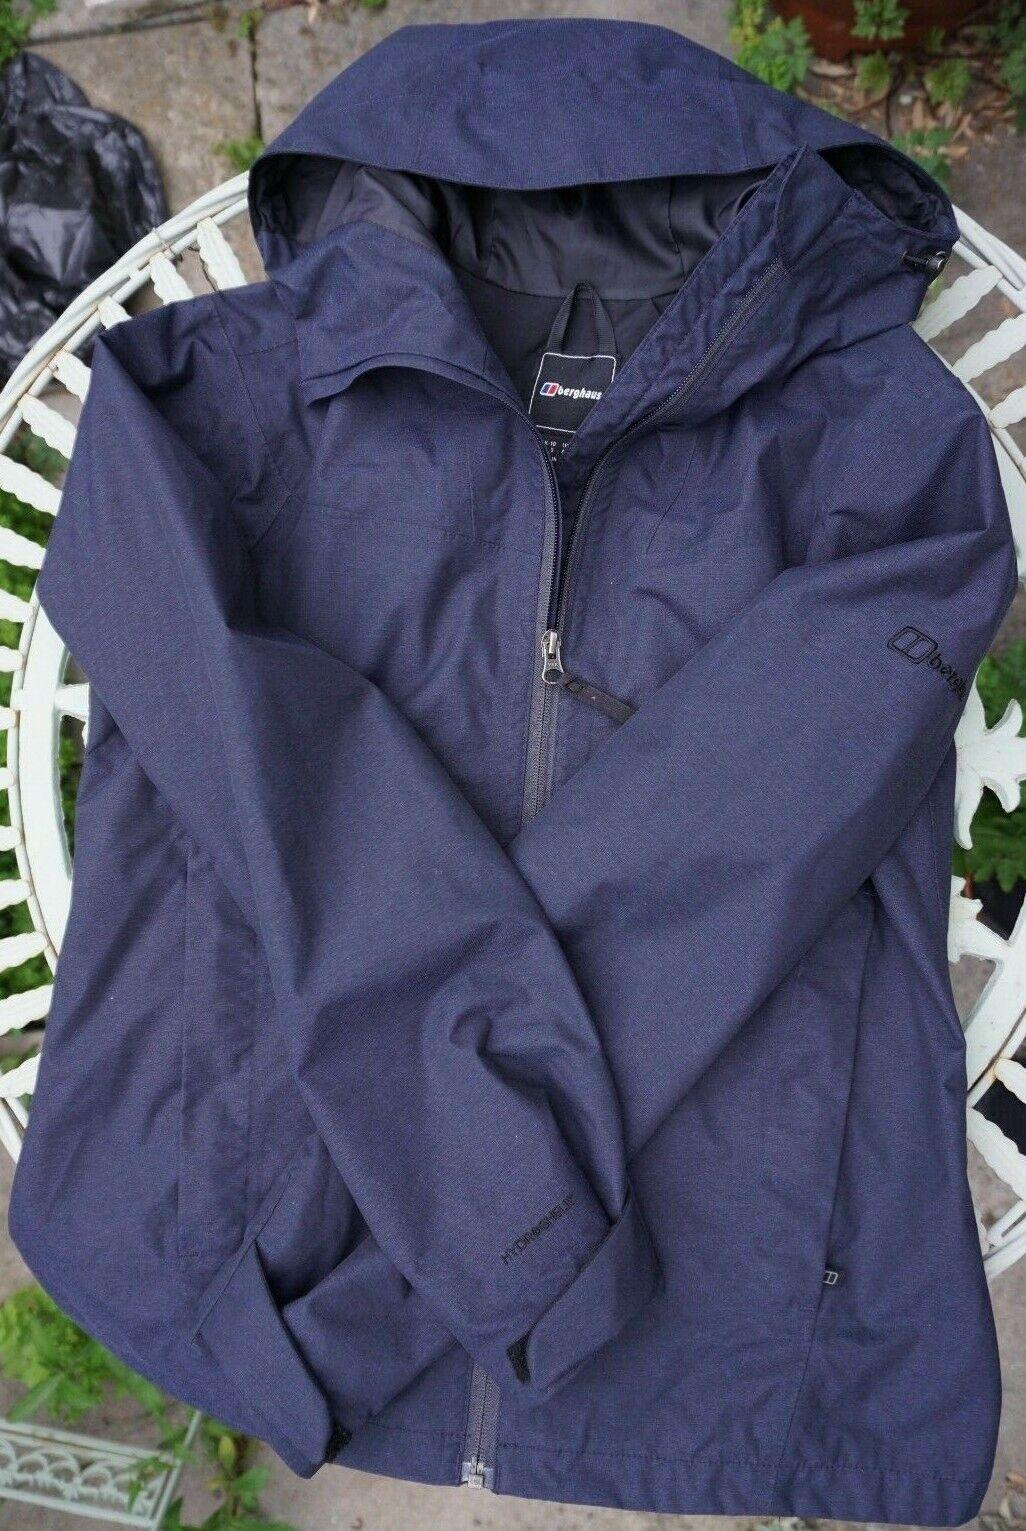 Womens BERGHAUS Hydroshell Blue Hooded Waterproof Jacket Coat Size UK 10